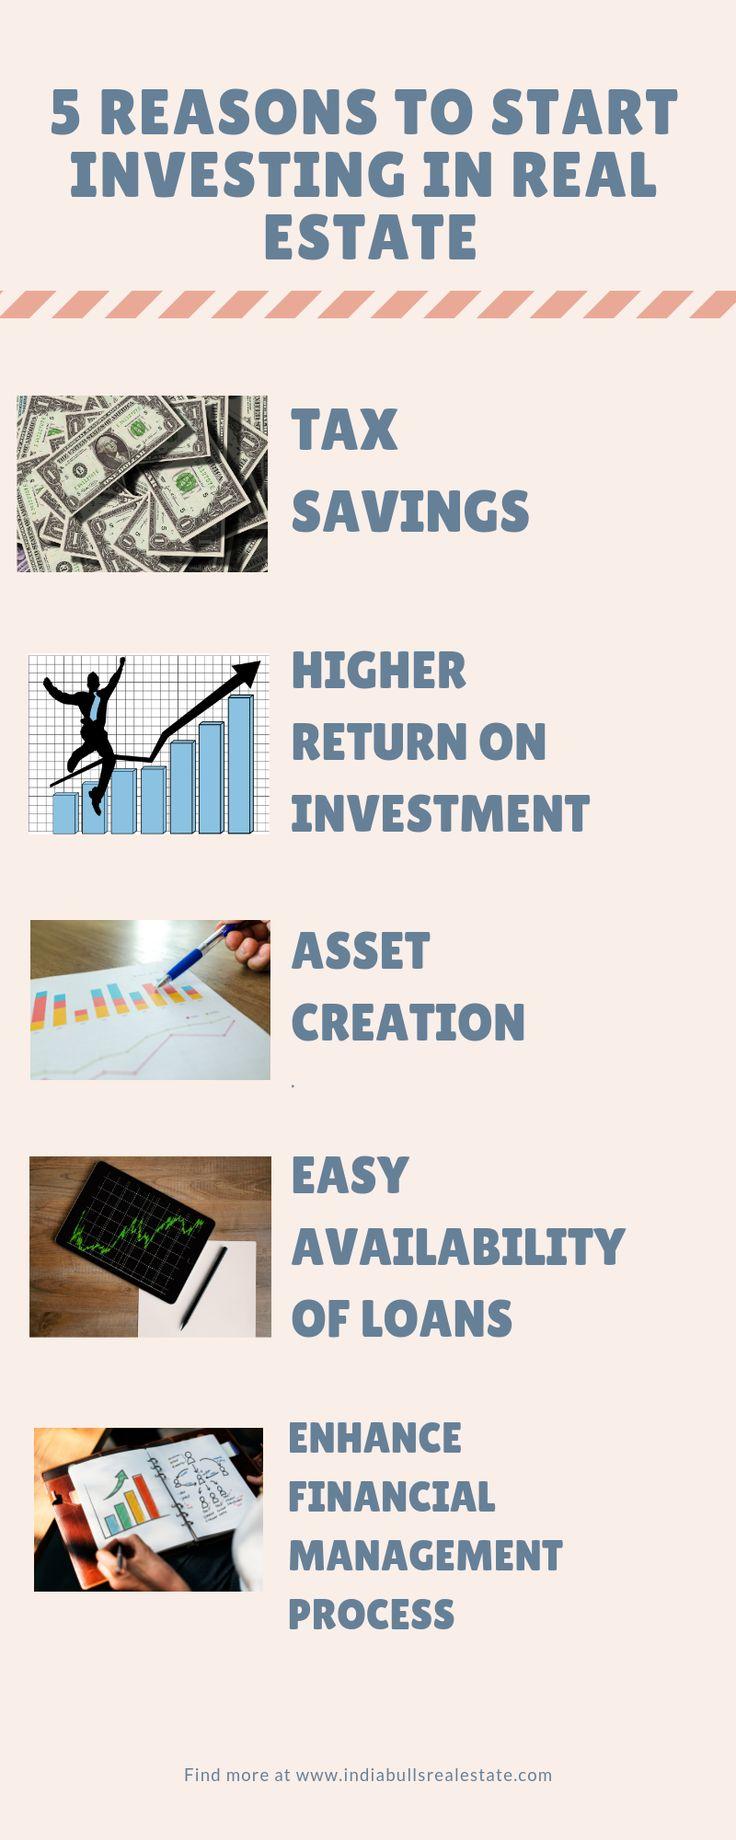 Indiabulls Real EstateTop Real Estate Developers In India